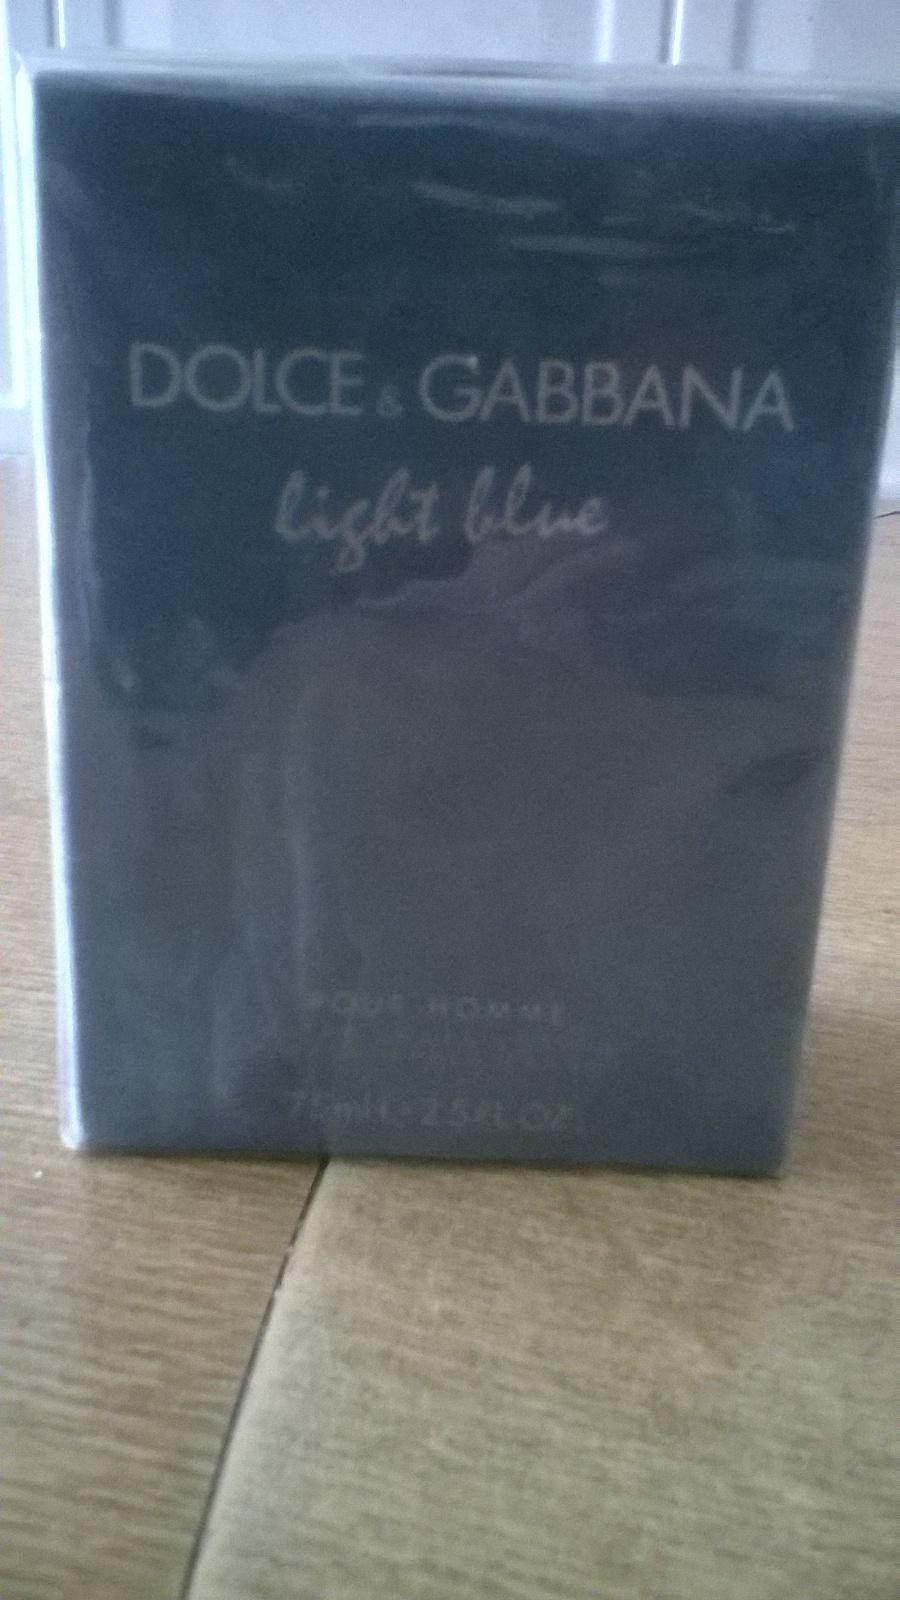 Perfume_LightBlue_DolceGabanna_20180406